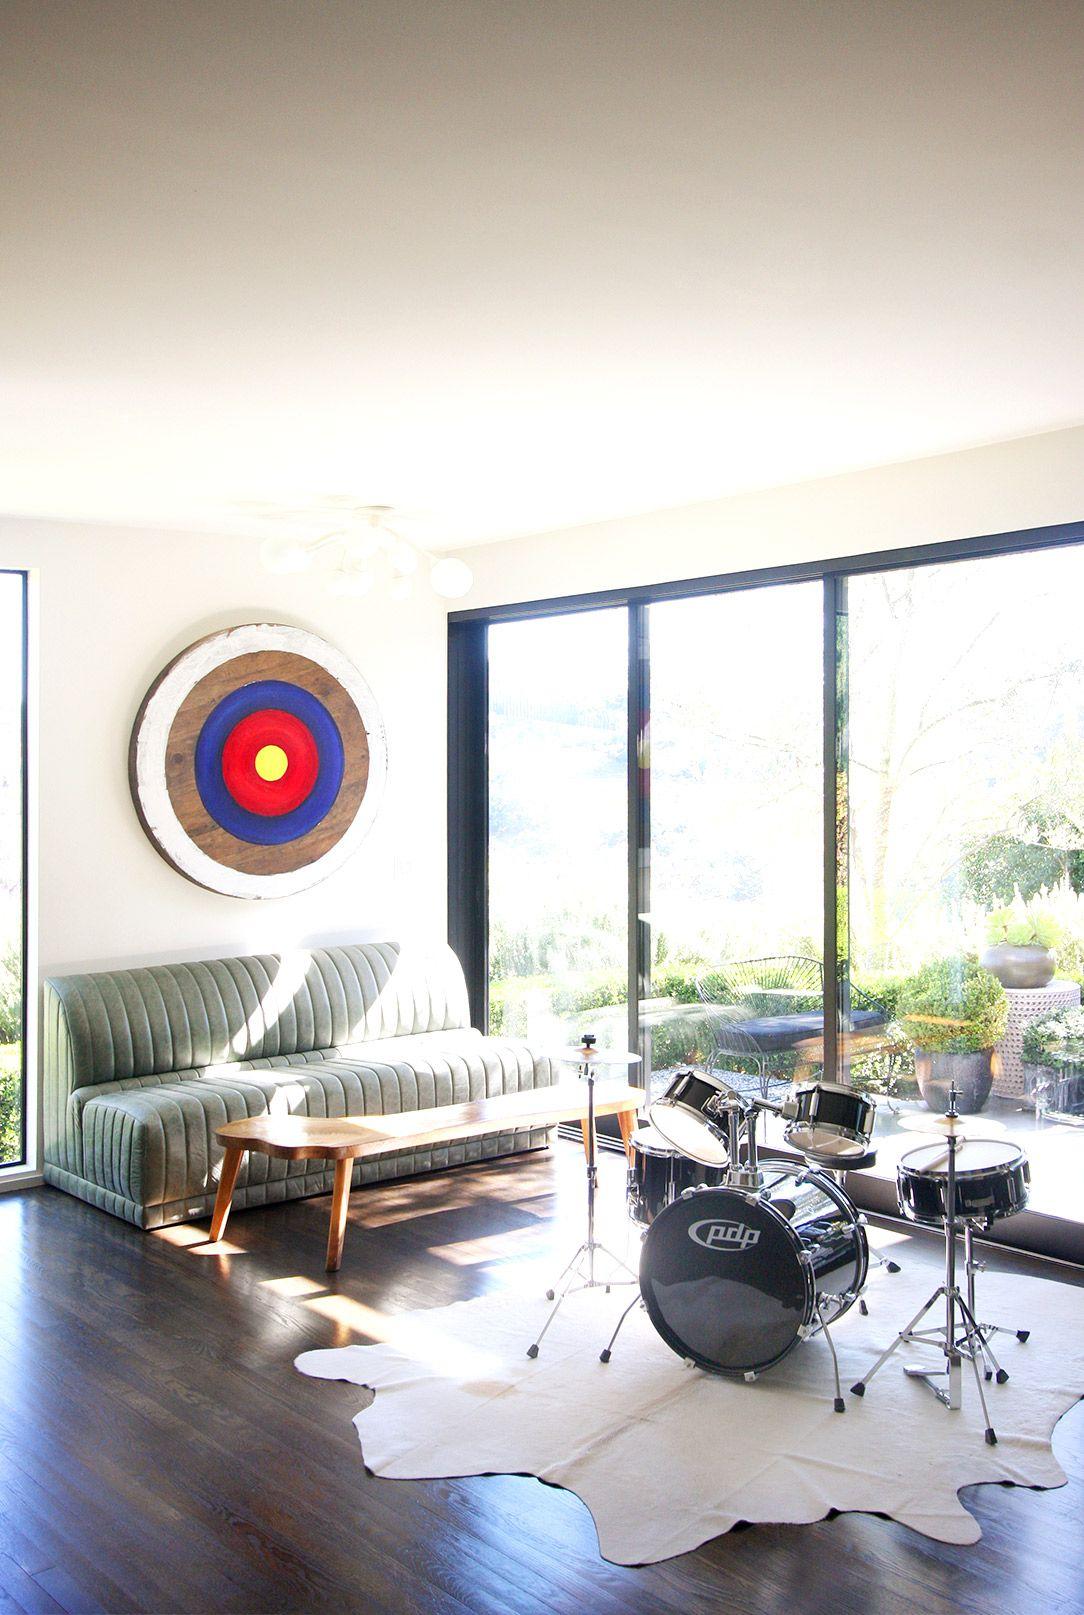 designer crush: cuffhome | rustic modern living room, rustic